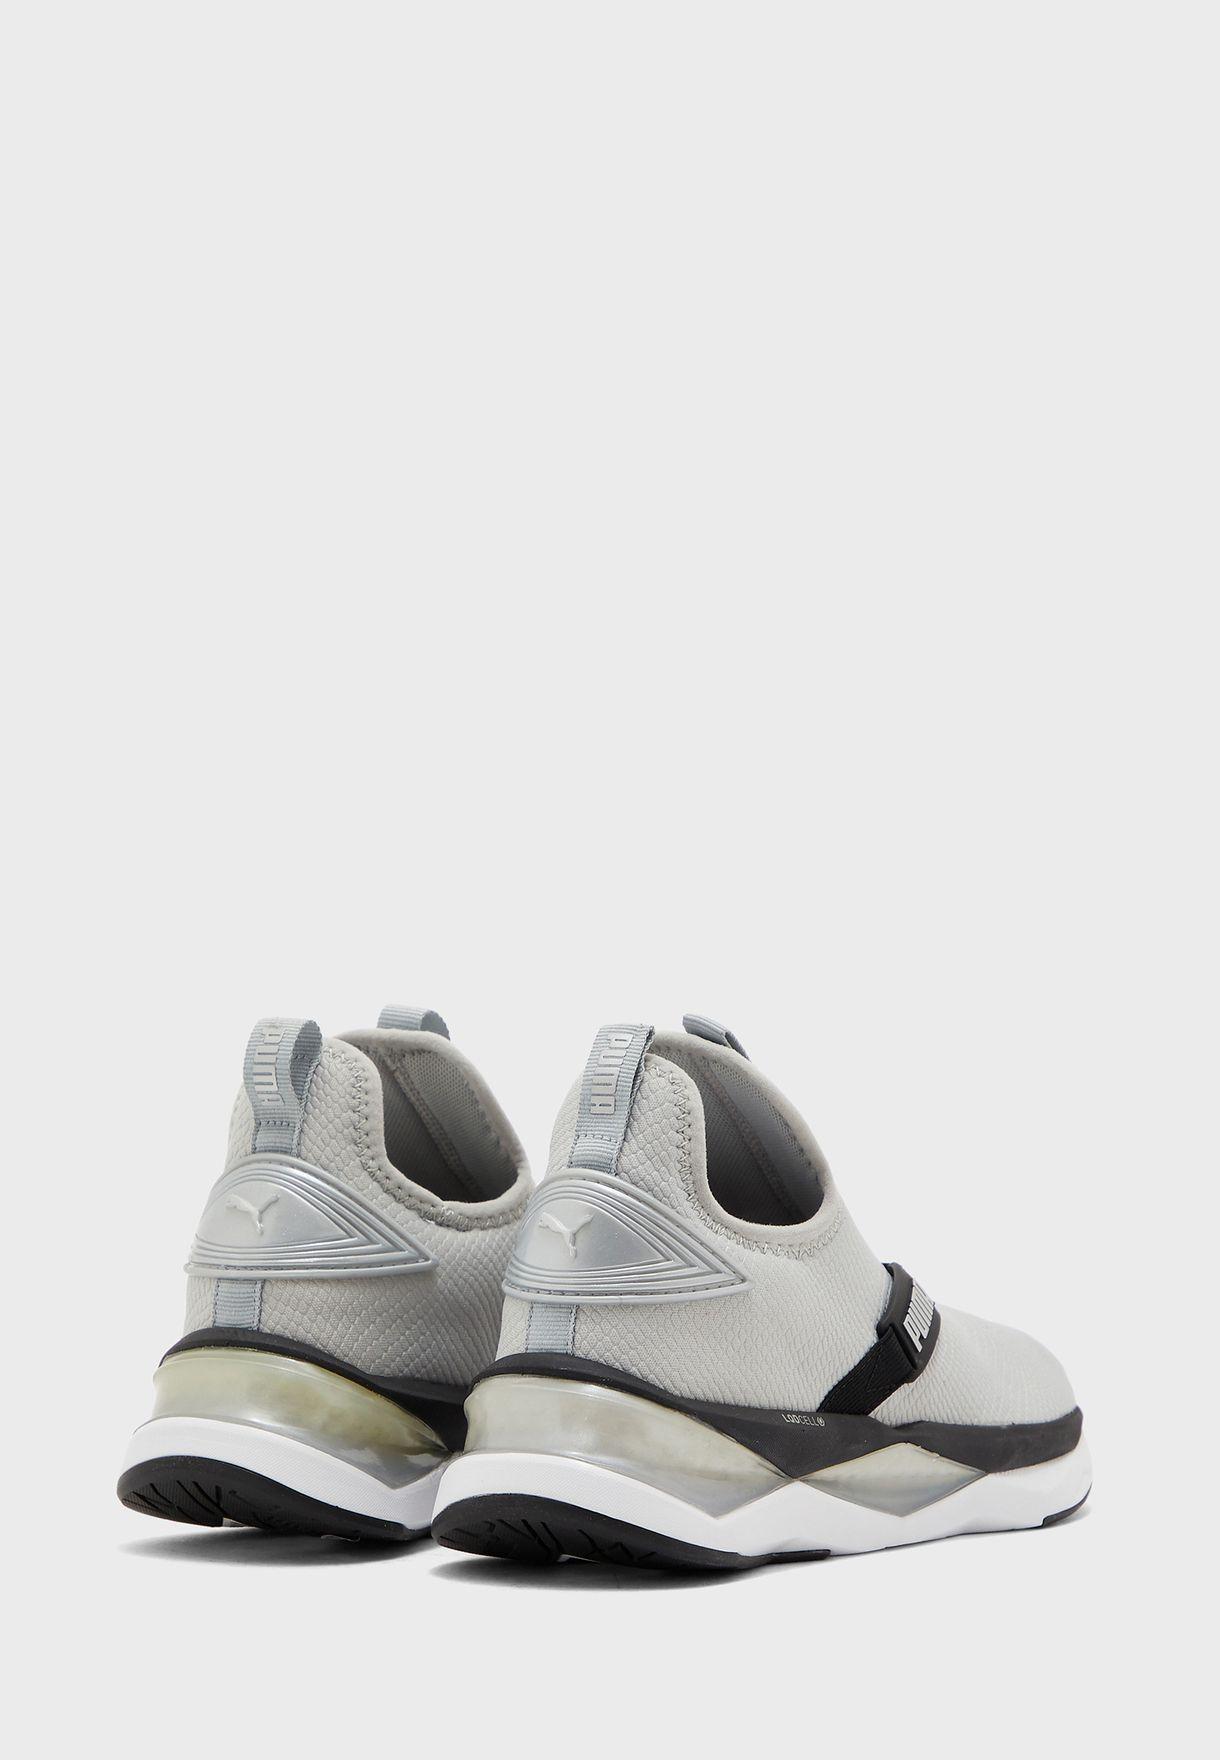 حذاء ال كيو دي سيل شاتر ميد